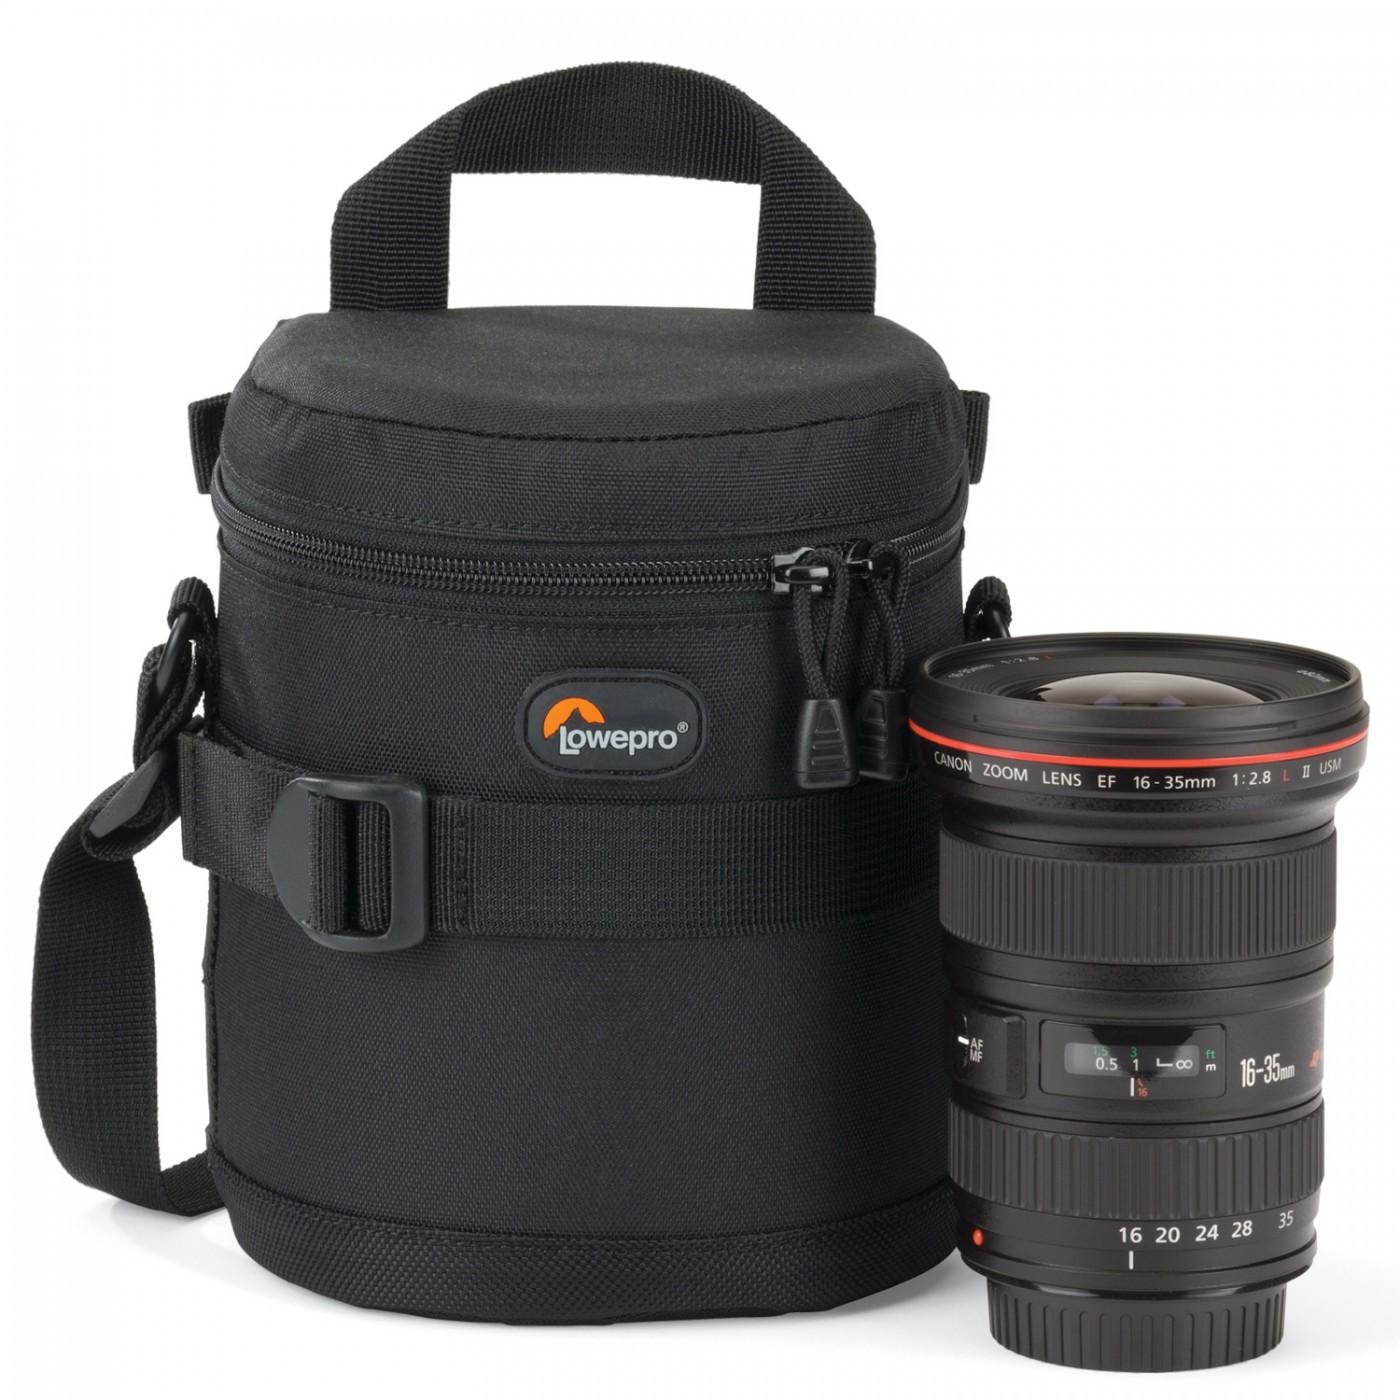 Lowepro Best Brand Buy In Famcart Malaysia Camera It Gadget And Adventura Sh 120 Ii Black